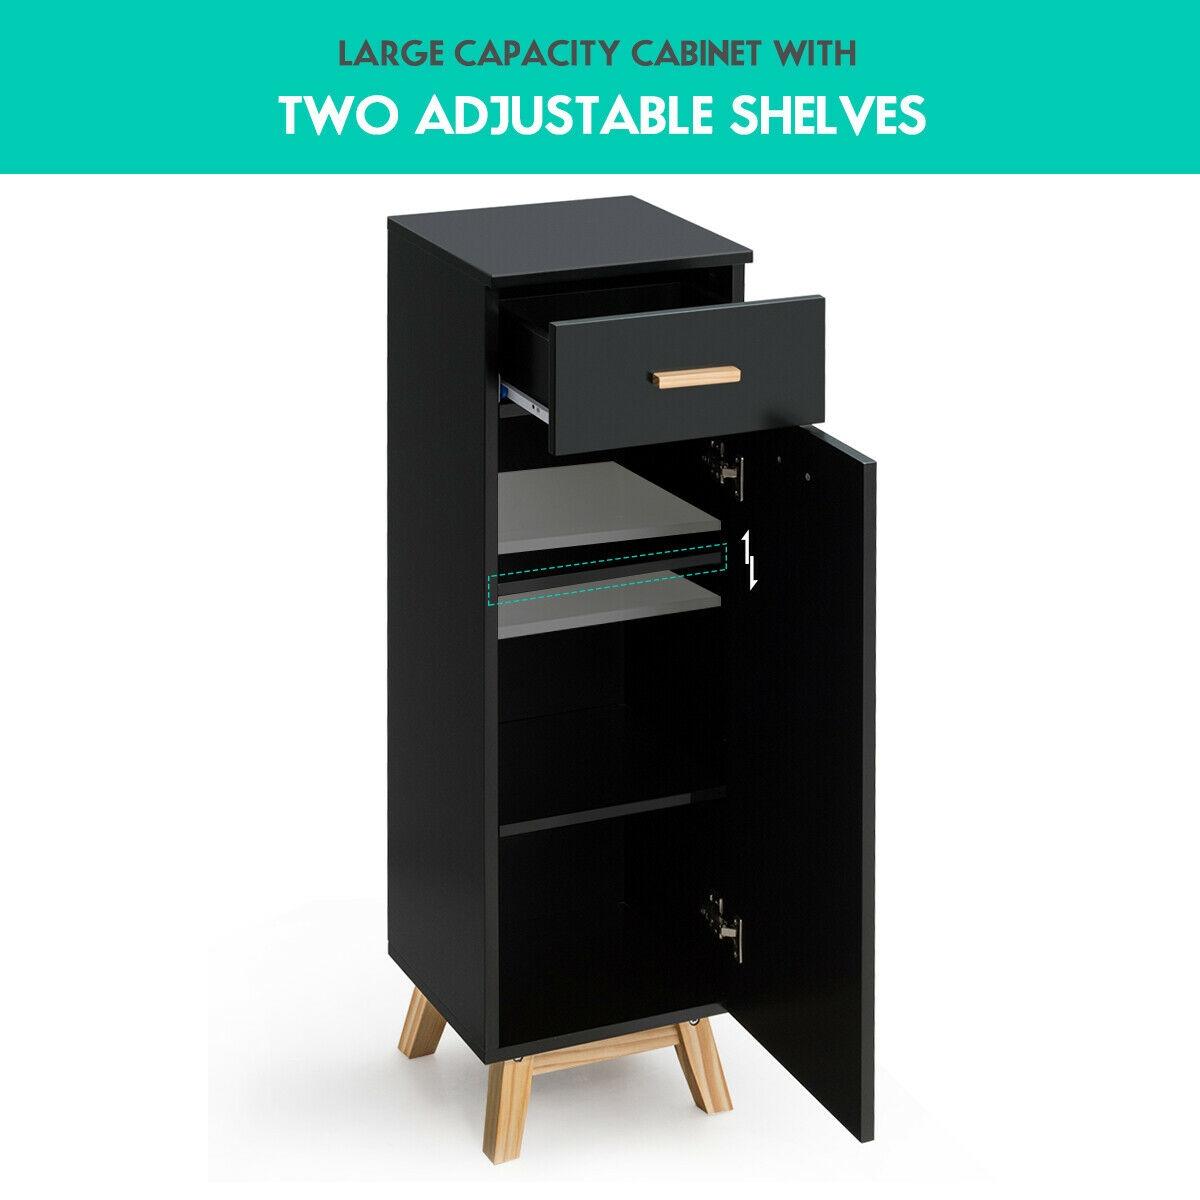 Waterproof Bathroom Cabinet with Adjustable Shelves and Sliding Drawer